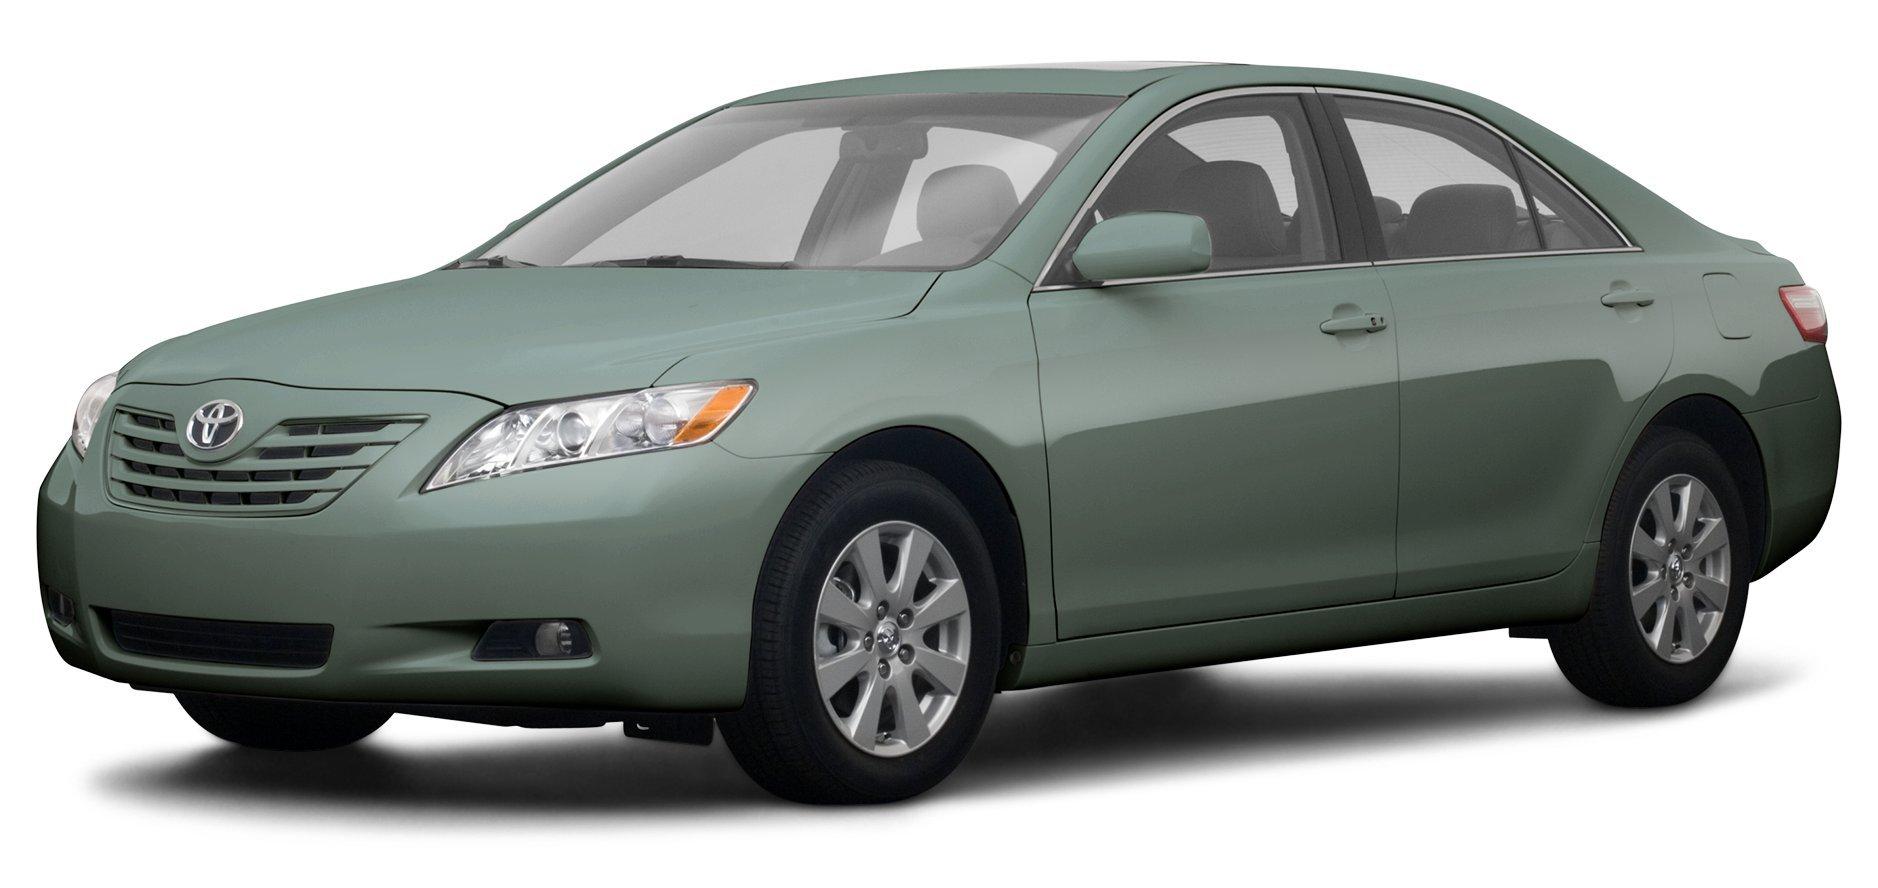 Amazon.com: 2009 Chevrolet Malibu Reviews, Images, and Specs: Vehicles